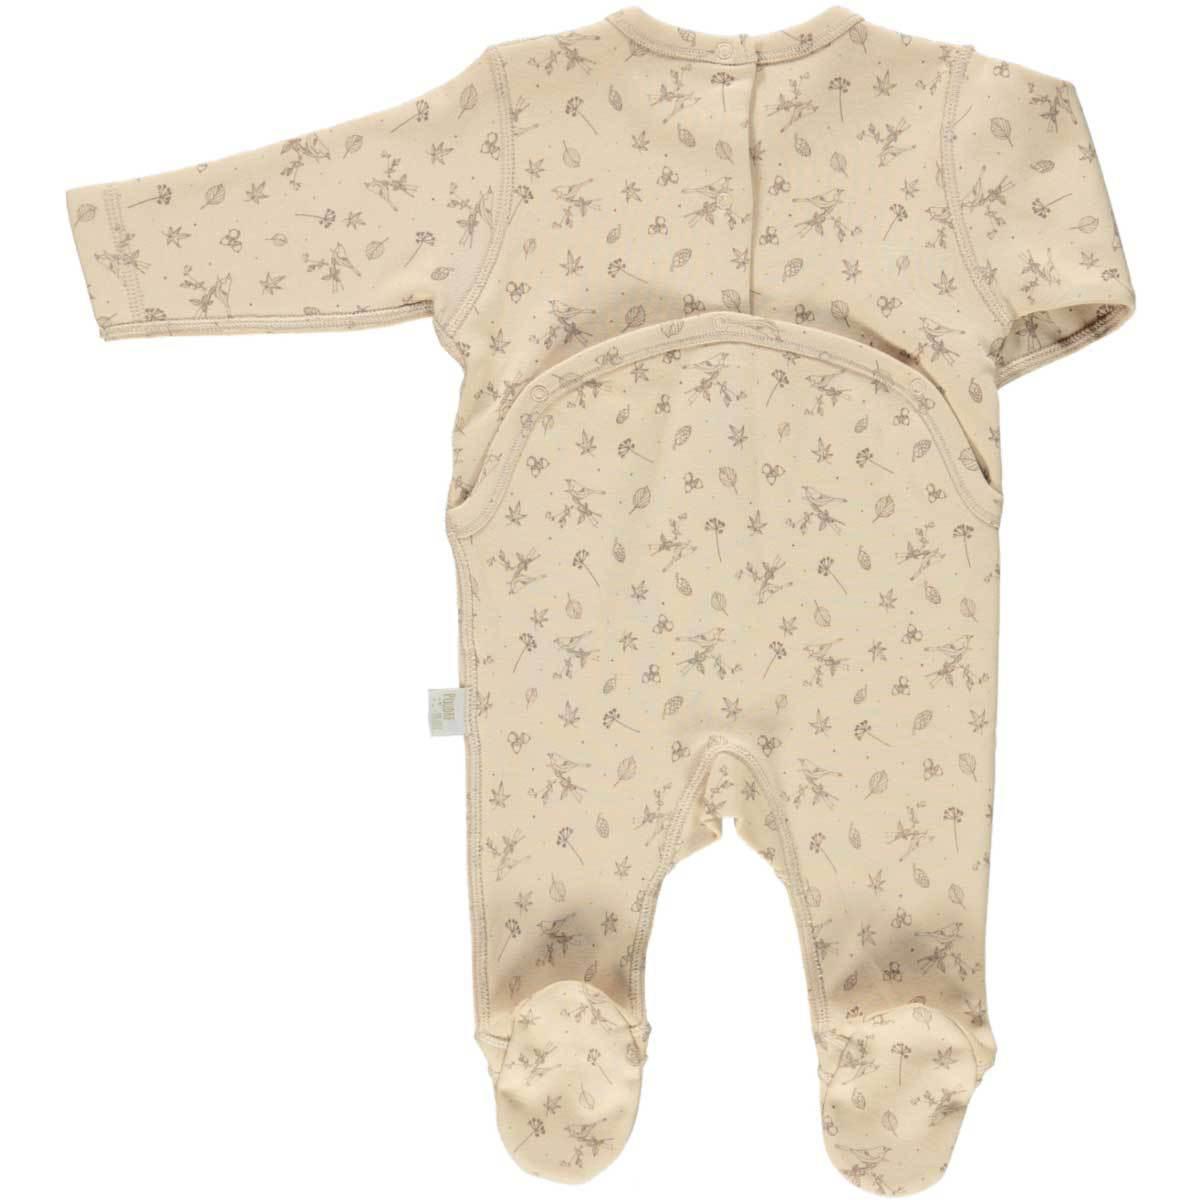 poudre organic pyjama ponteira amberlight 18 mois body et pyjama poudre organic sur l. Black Bedroom Furniture Sets. Home Design Ideas